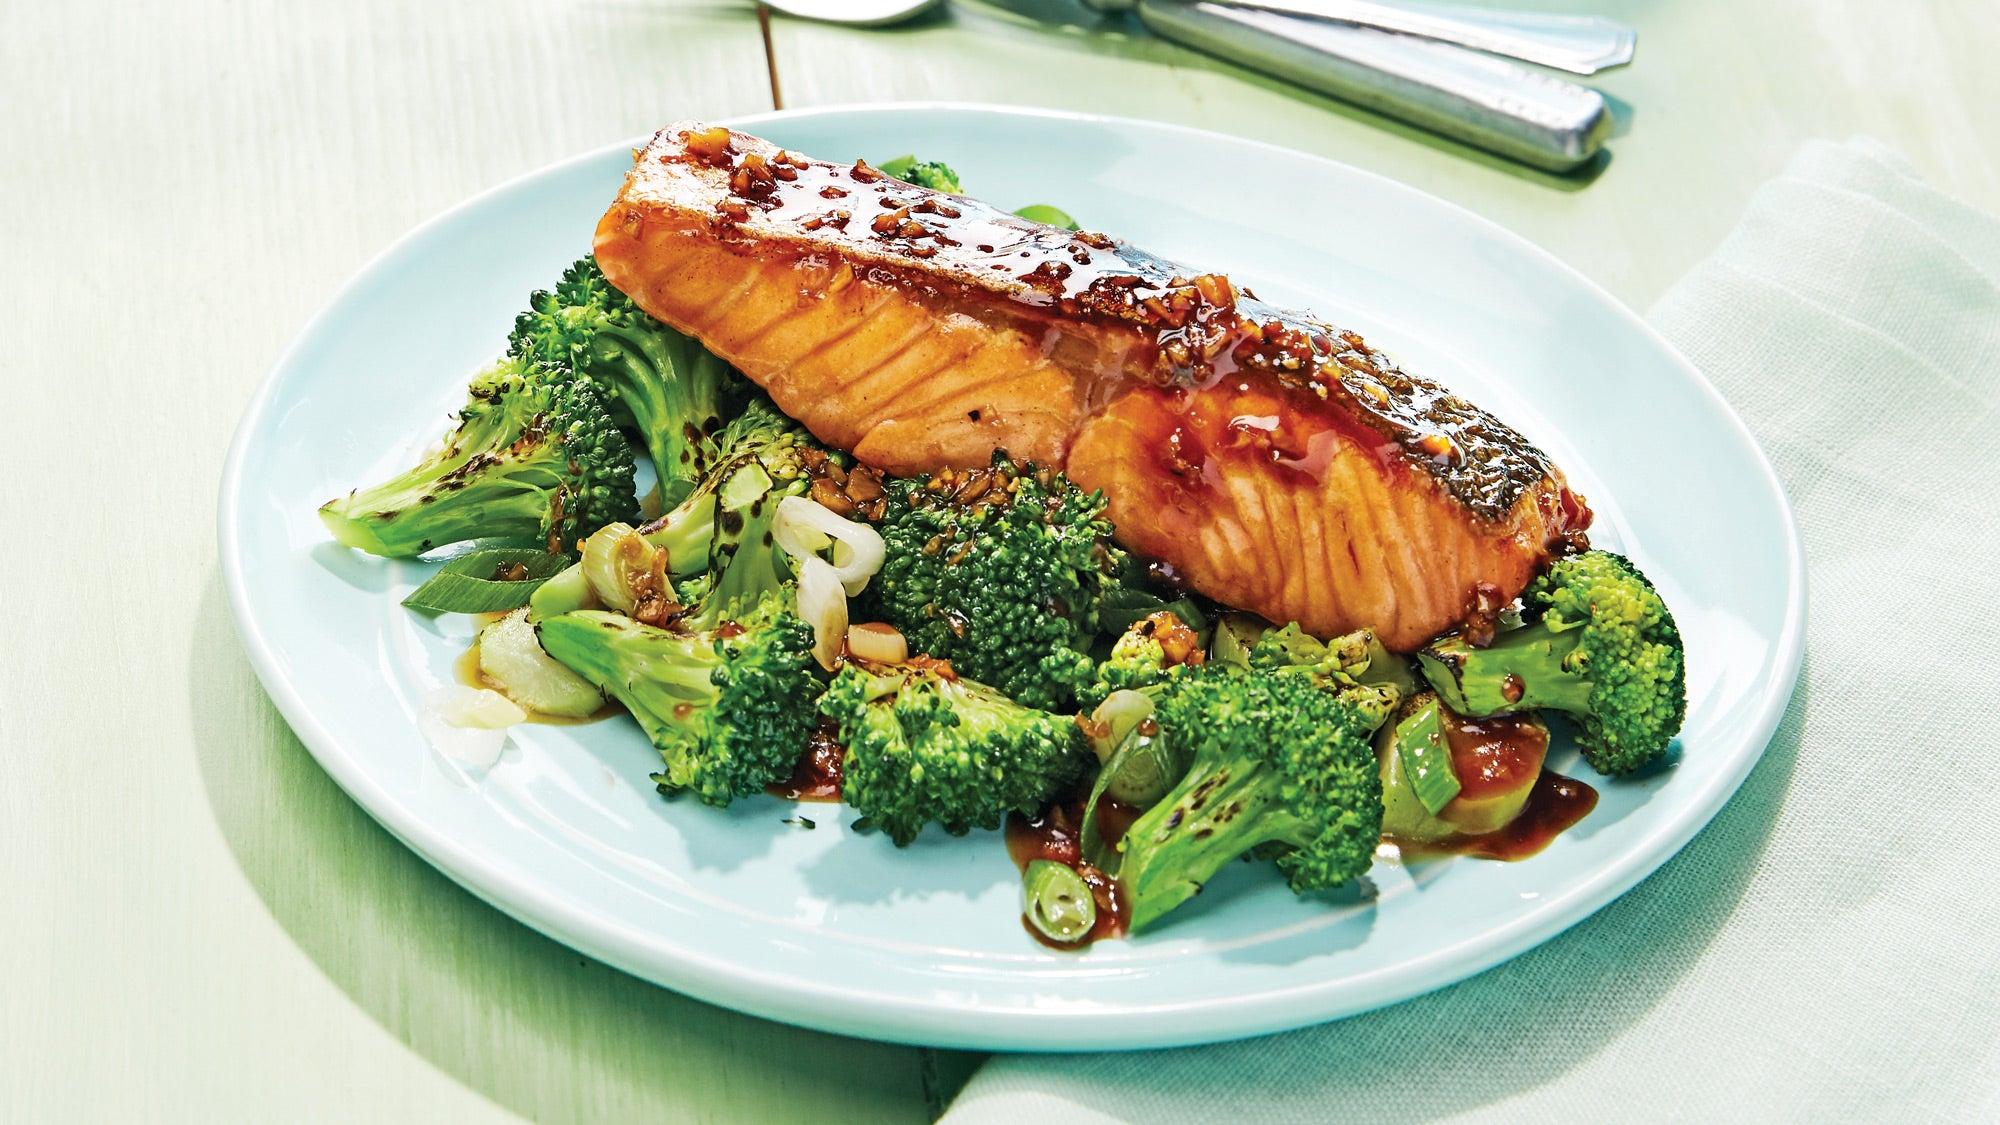 Roasted Salmon Teriyaki with Broccoli